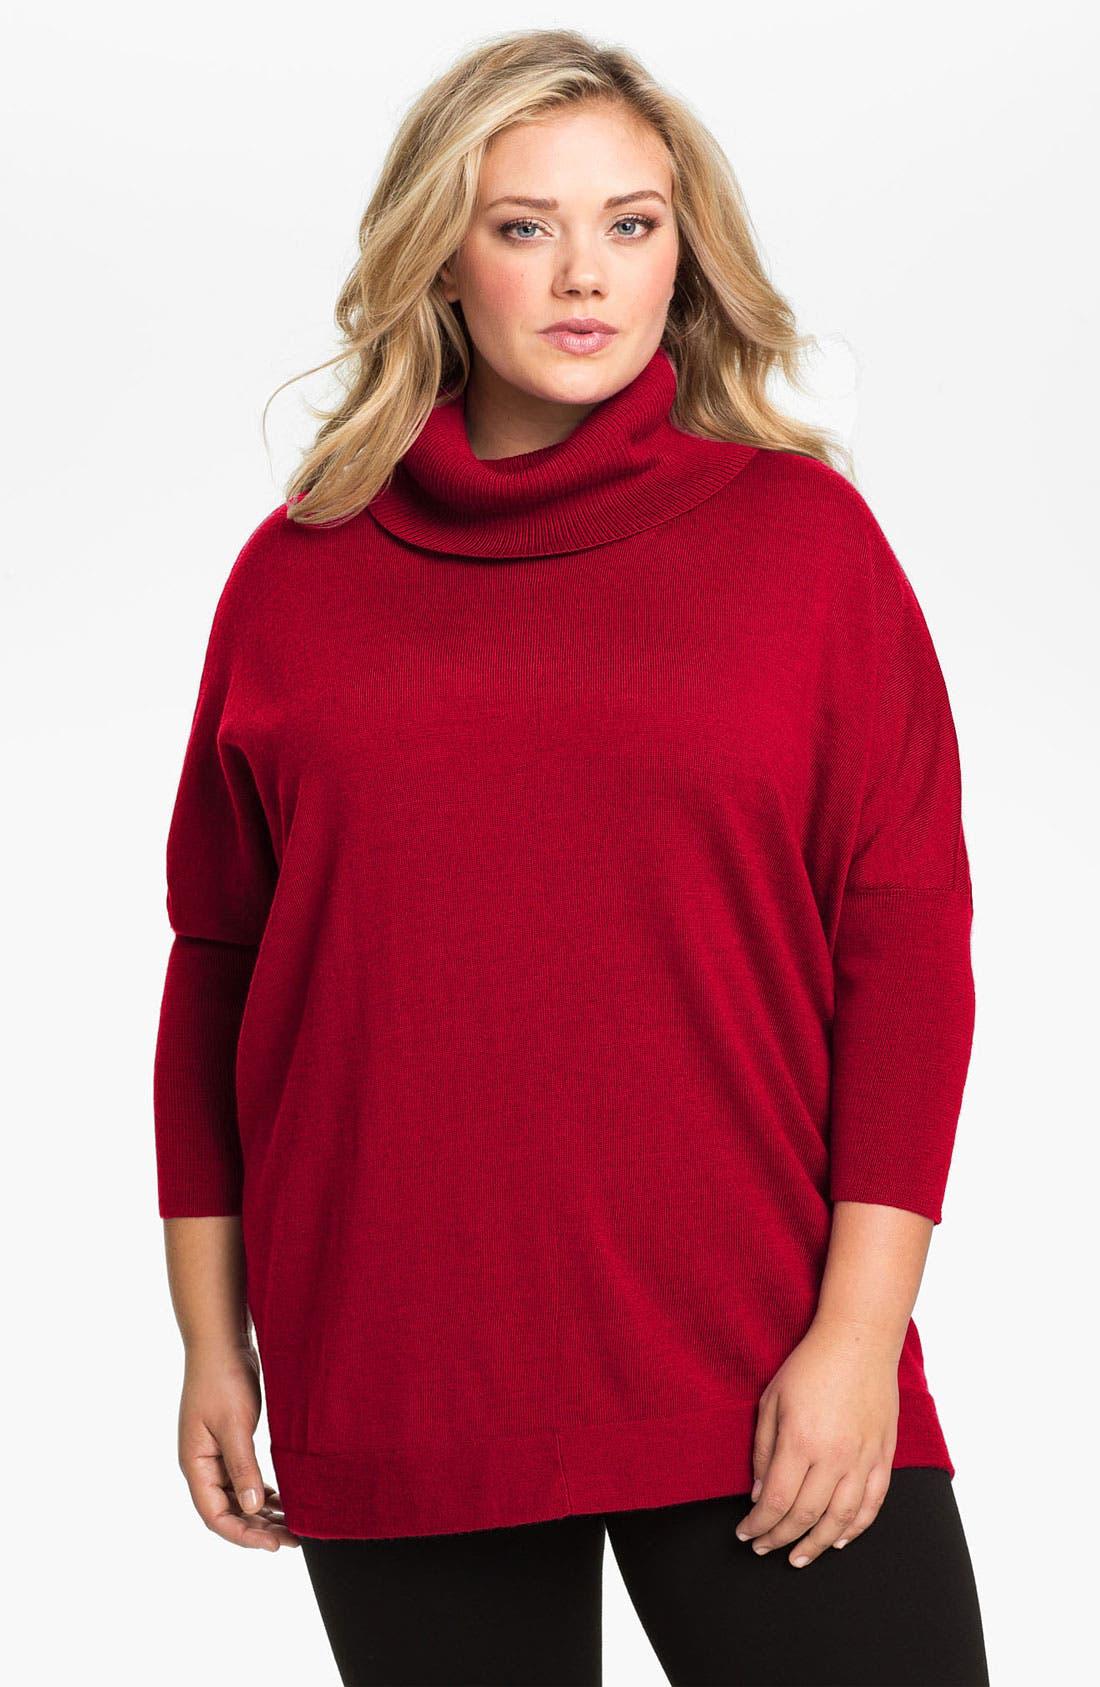 Alternate Image 1 Selected - Eileen Fisher Merino Wool Funnel Neck Sweater (Plus)